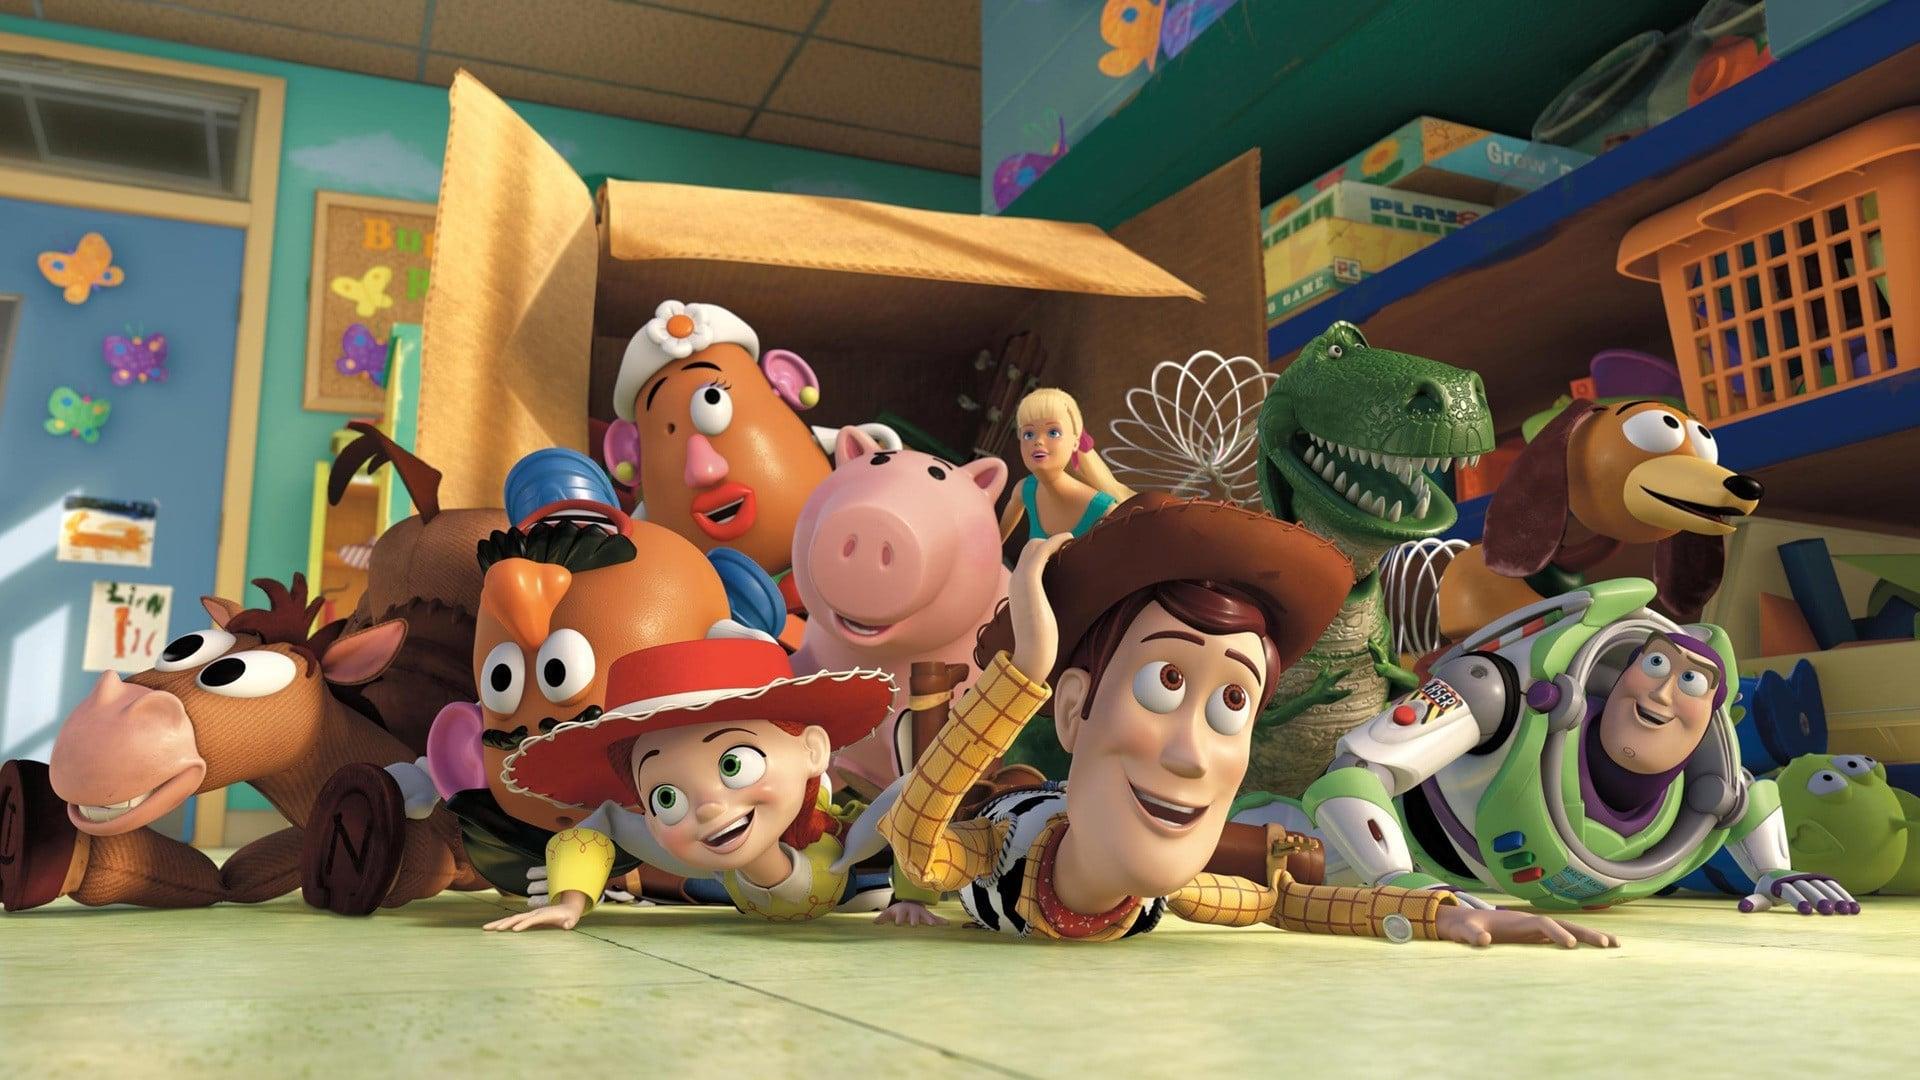 Regarder Toy Story 3 en streaming gratuit